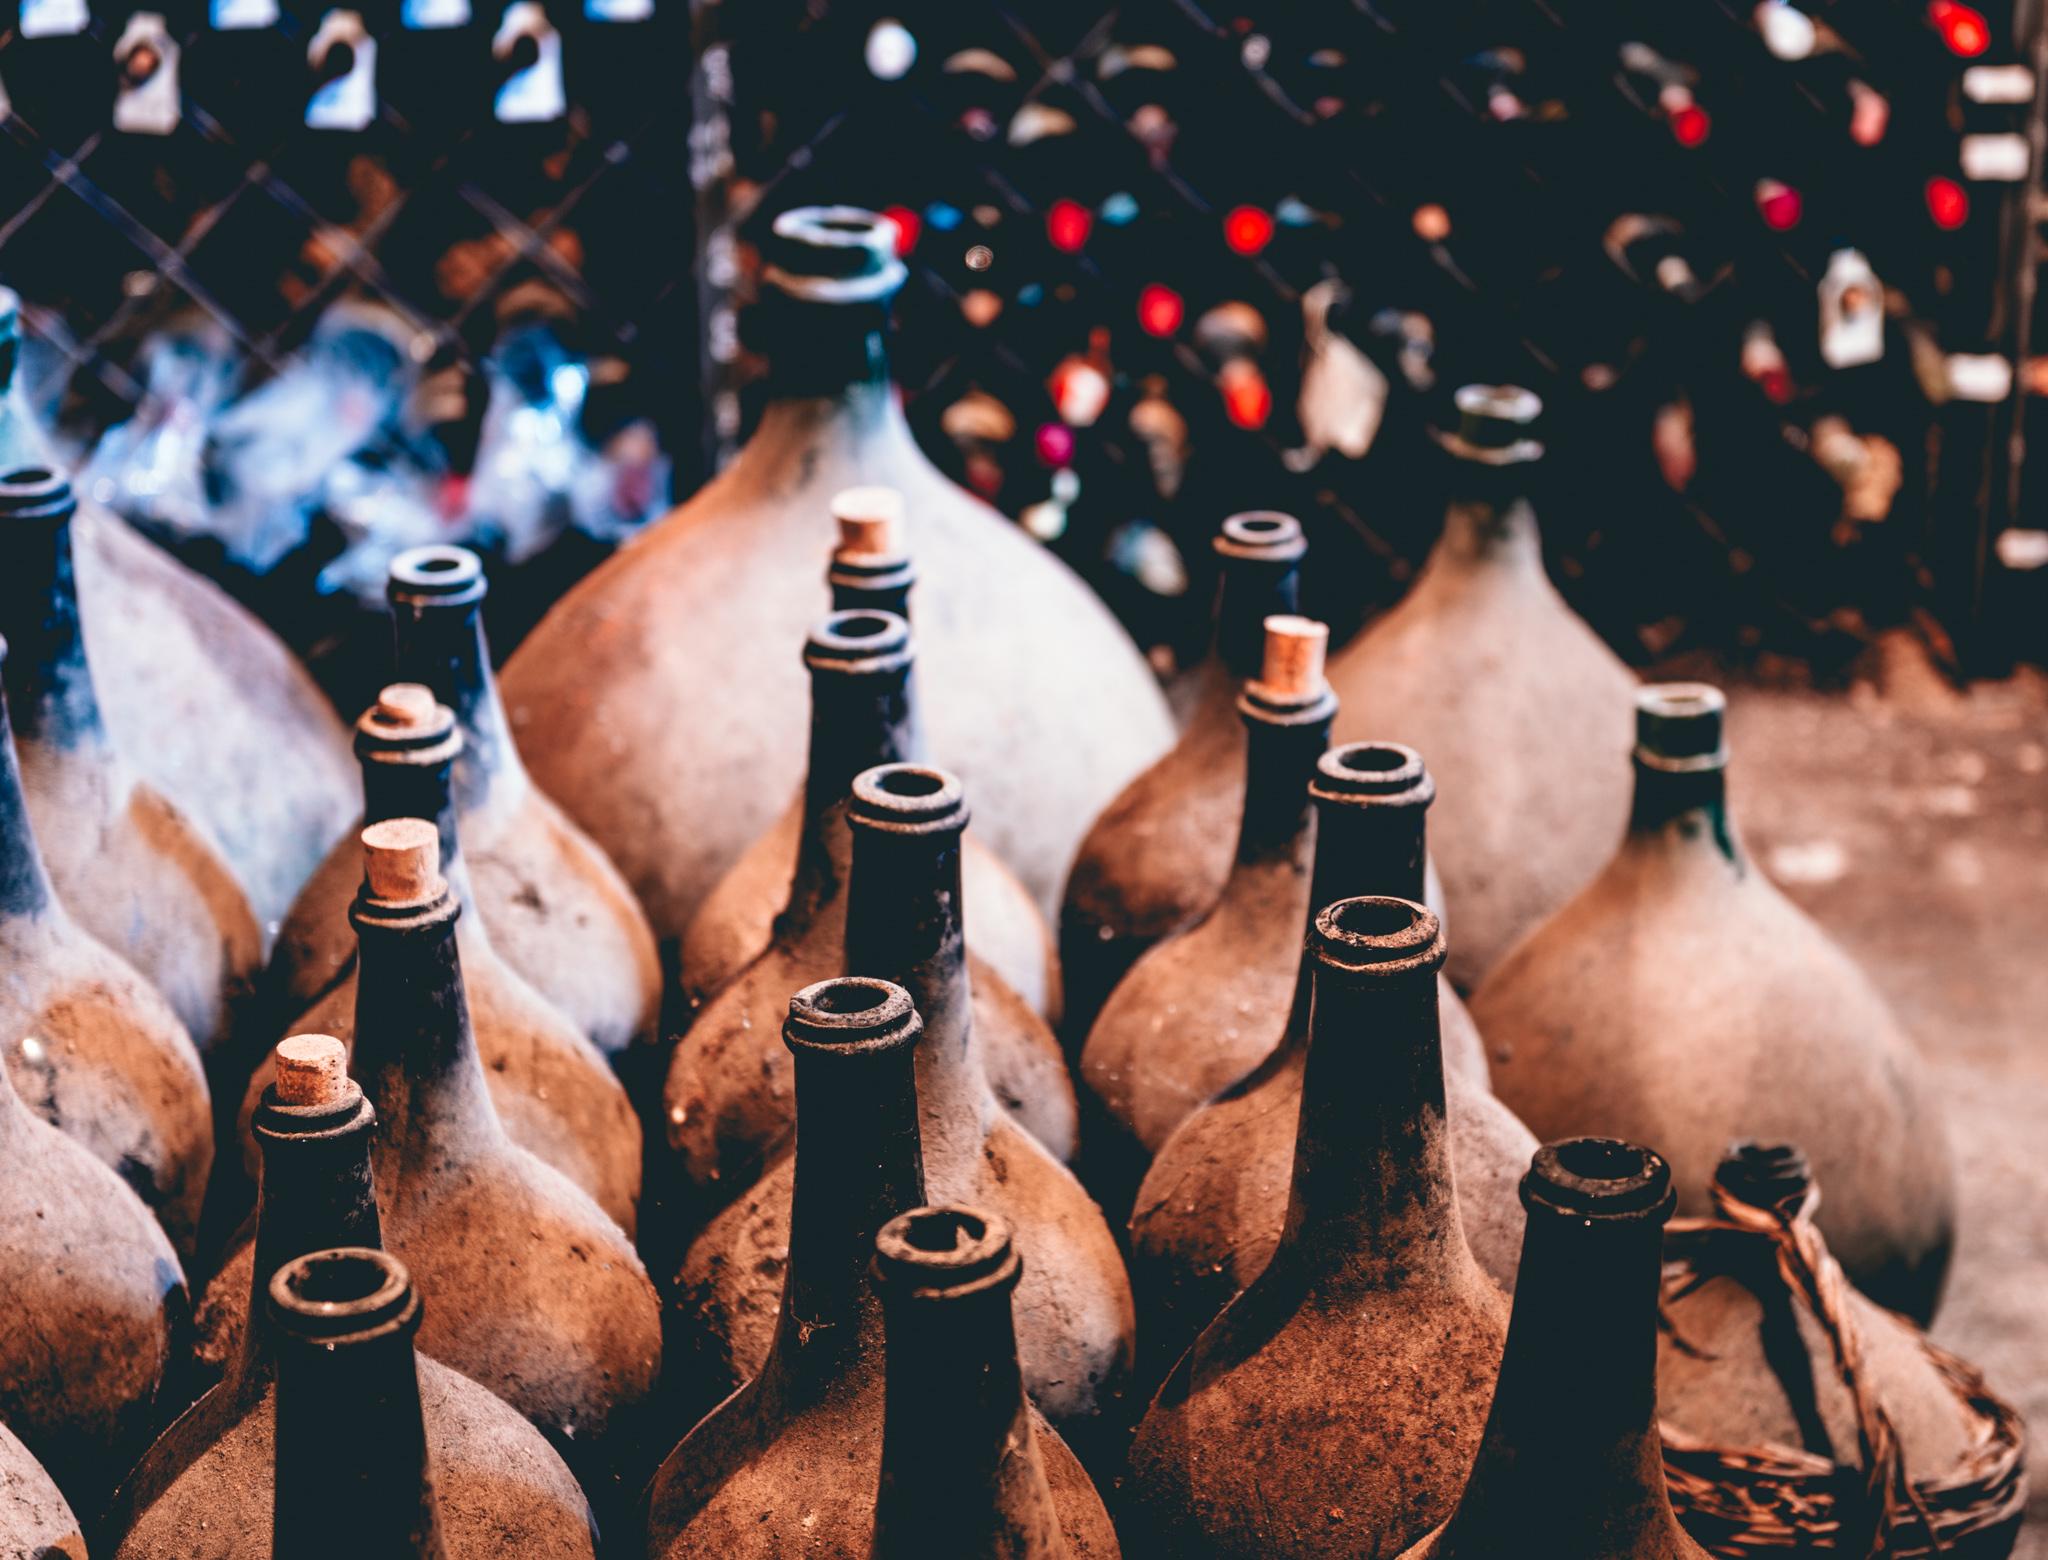 Italy : Piedmont : Demijohns in the cellar at Bartolo Mascarello in Barolo